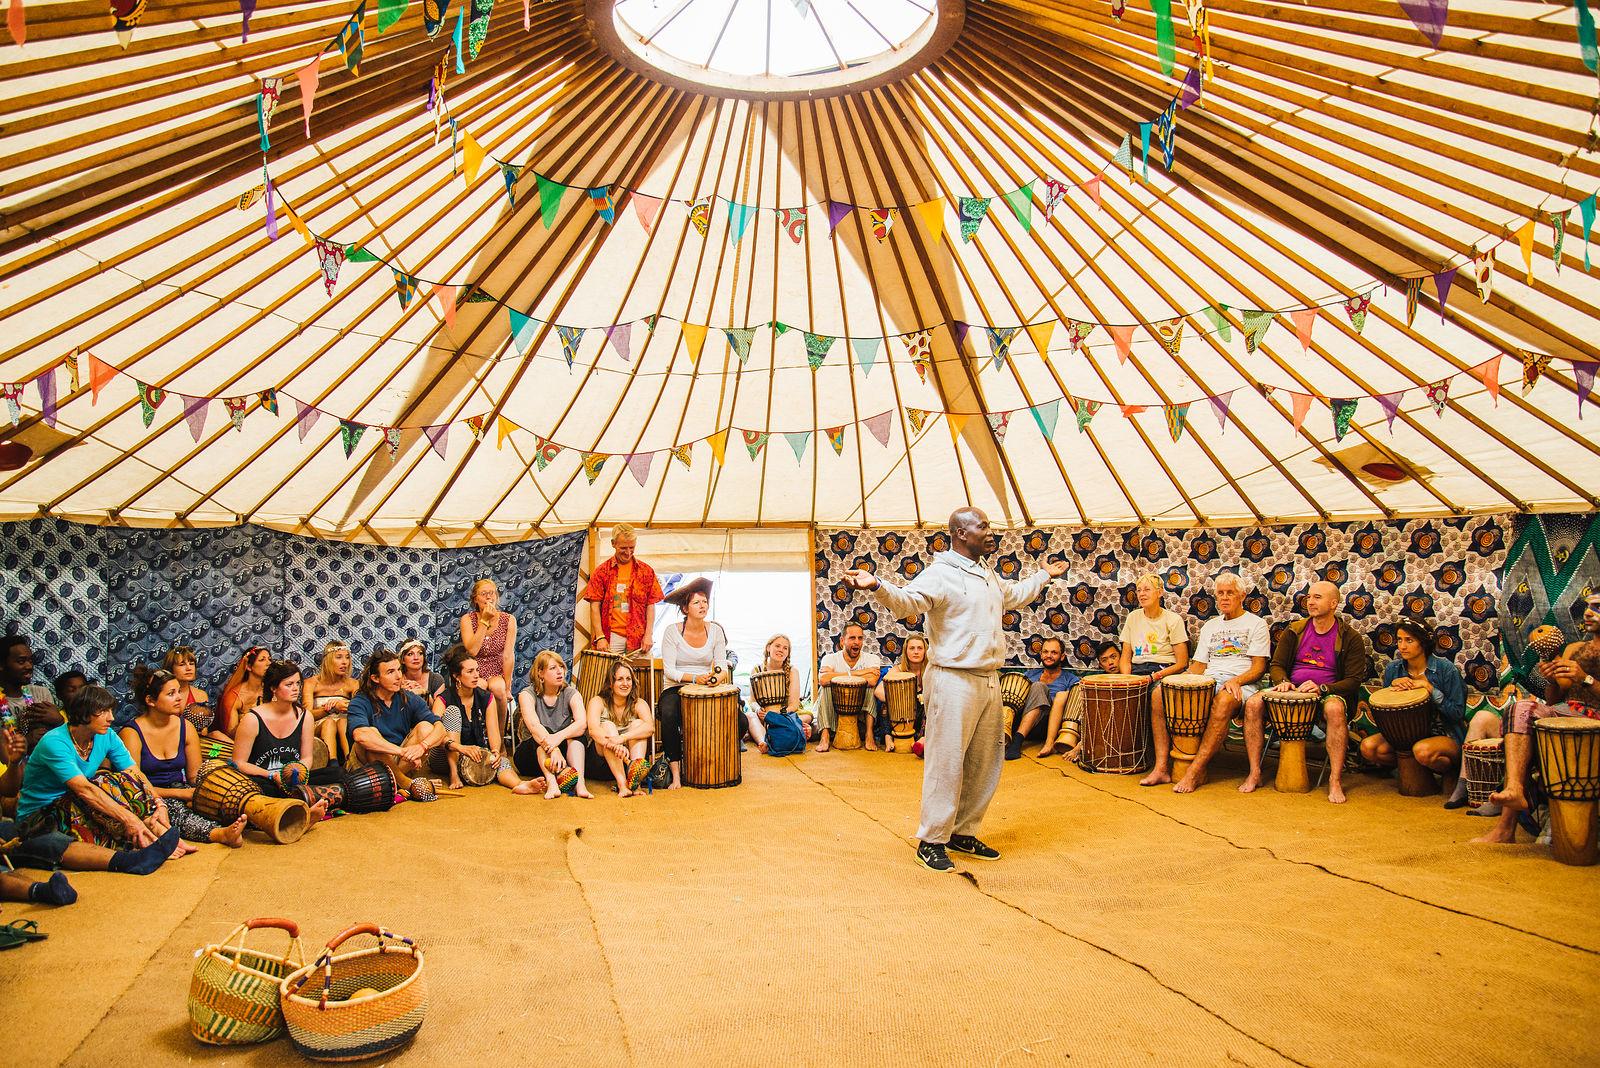 Bido Irie - Drumming from the Ivory Coast